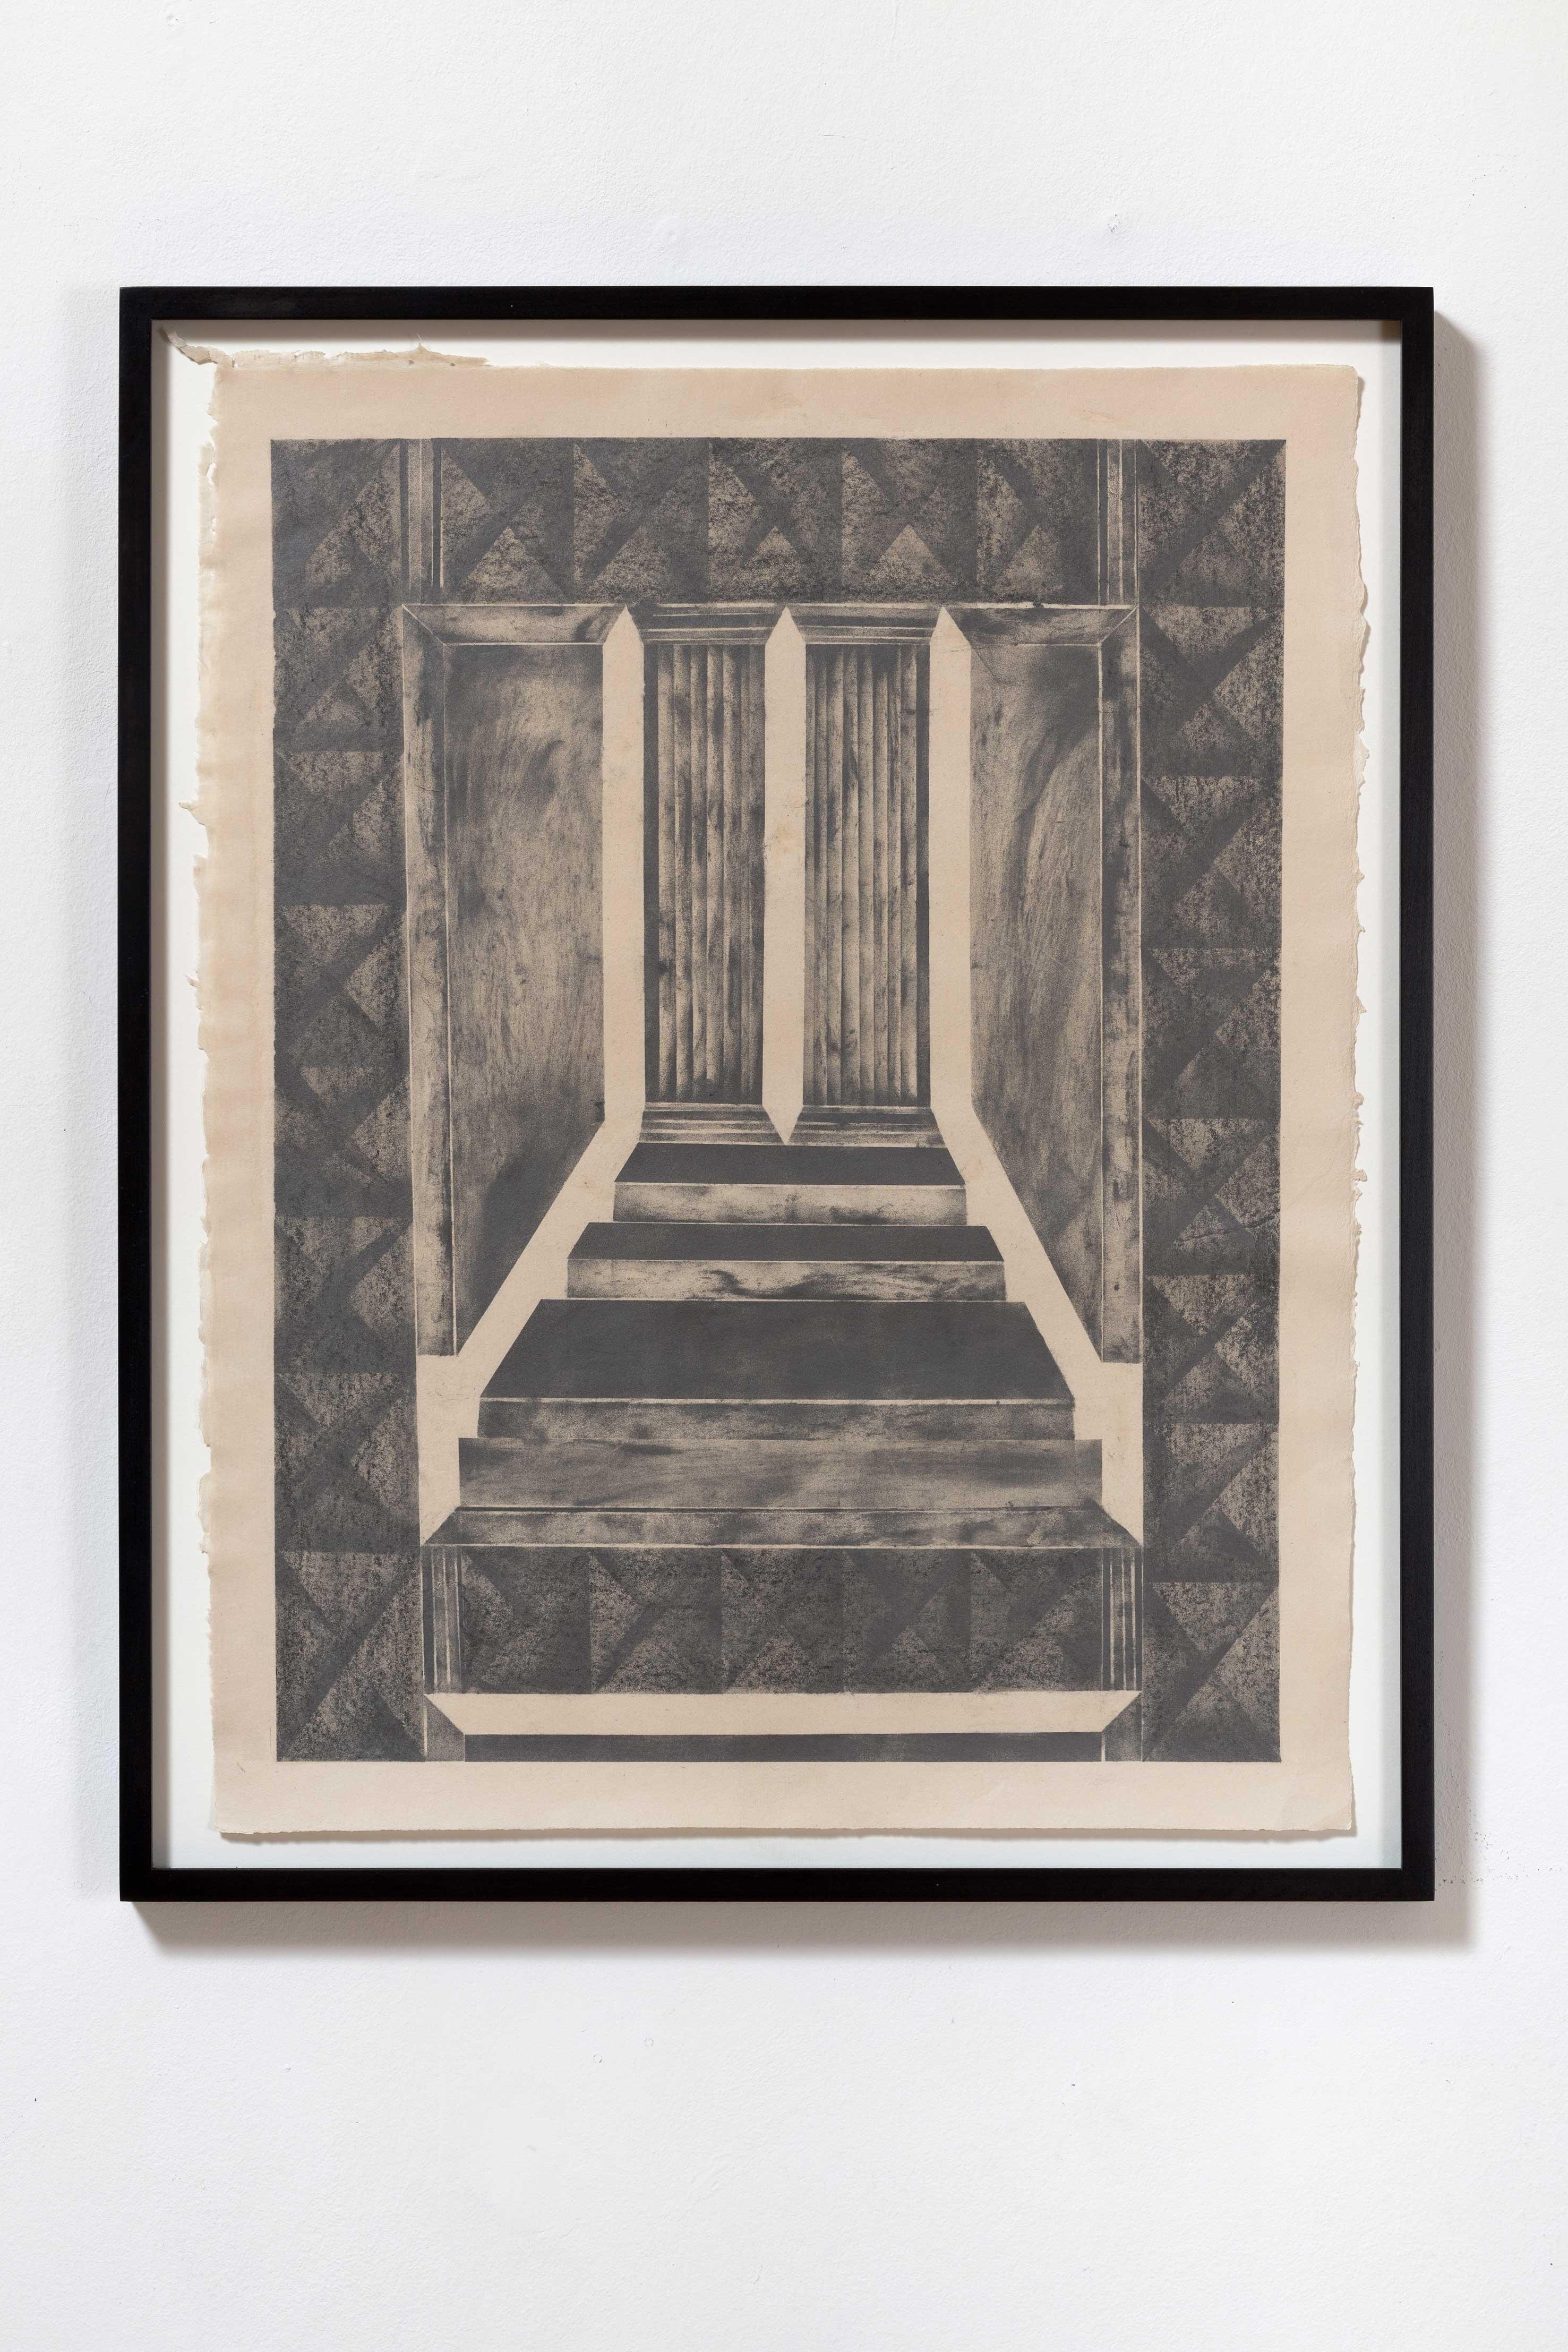 """ all I believe that happened there was vision VI"", Bleistift auf Papier, 67 x 53 cm (Foto: VILTIN Gallery / Dávid Biró)"